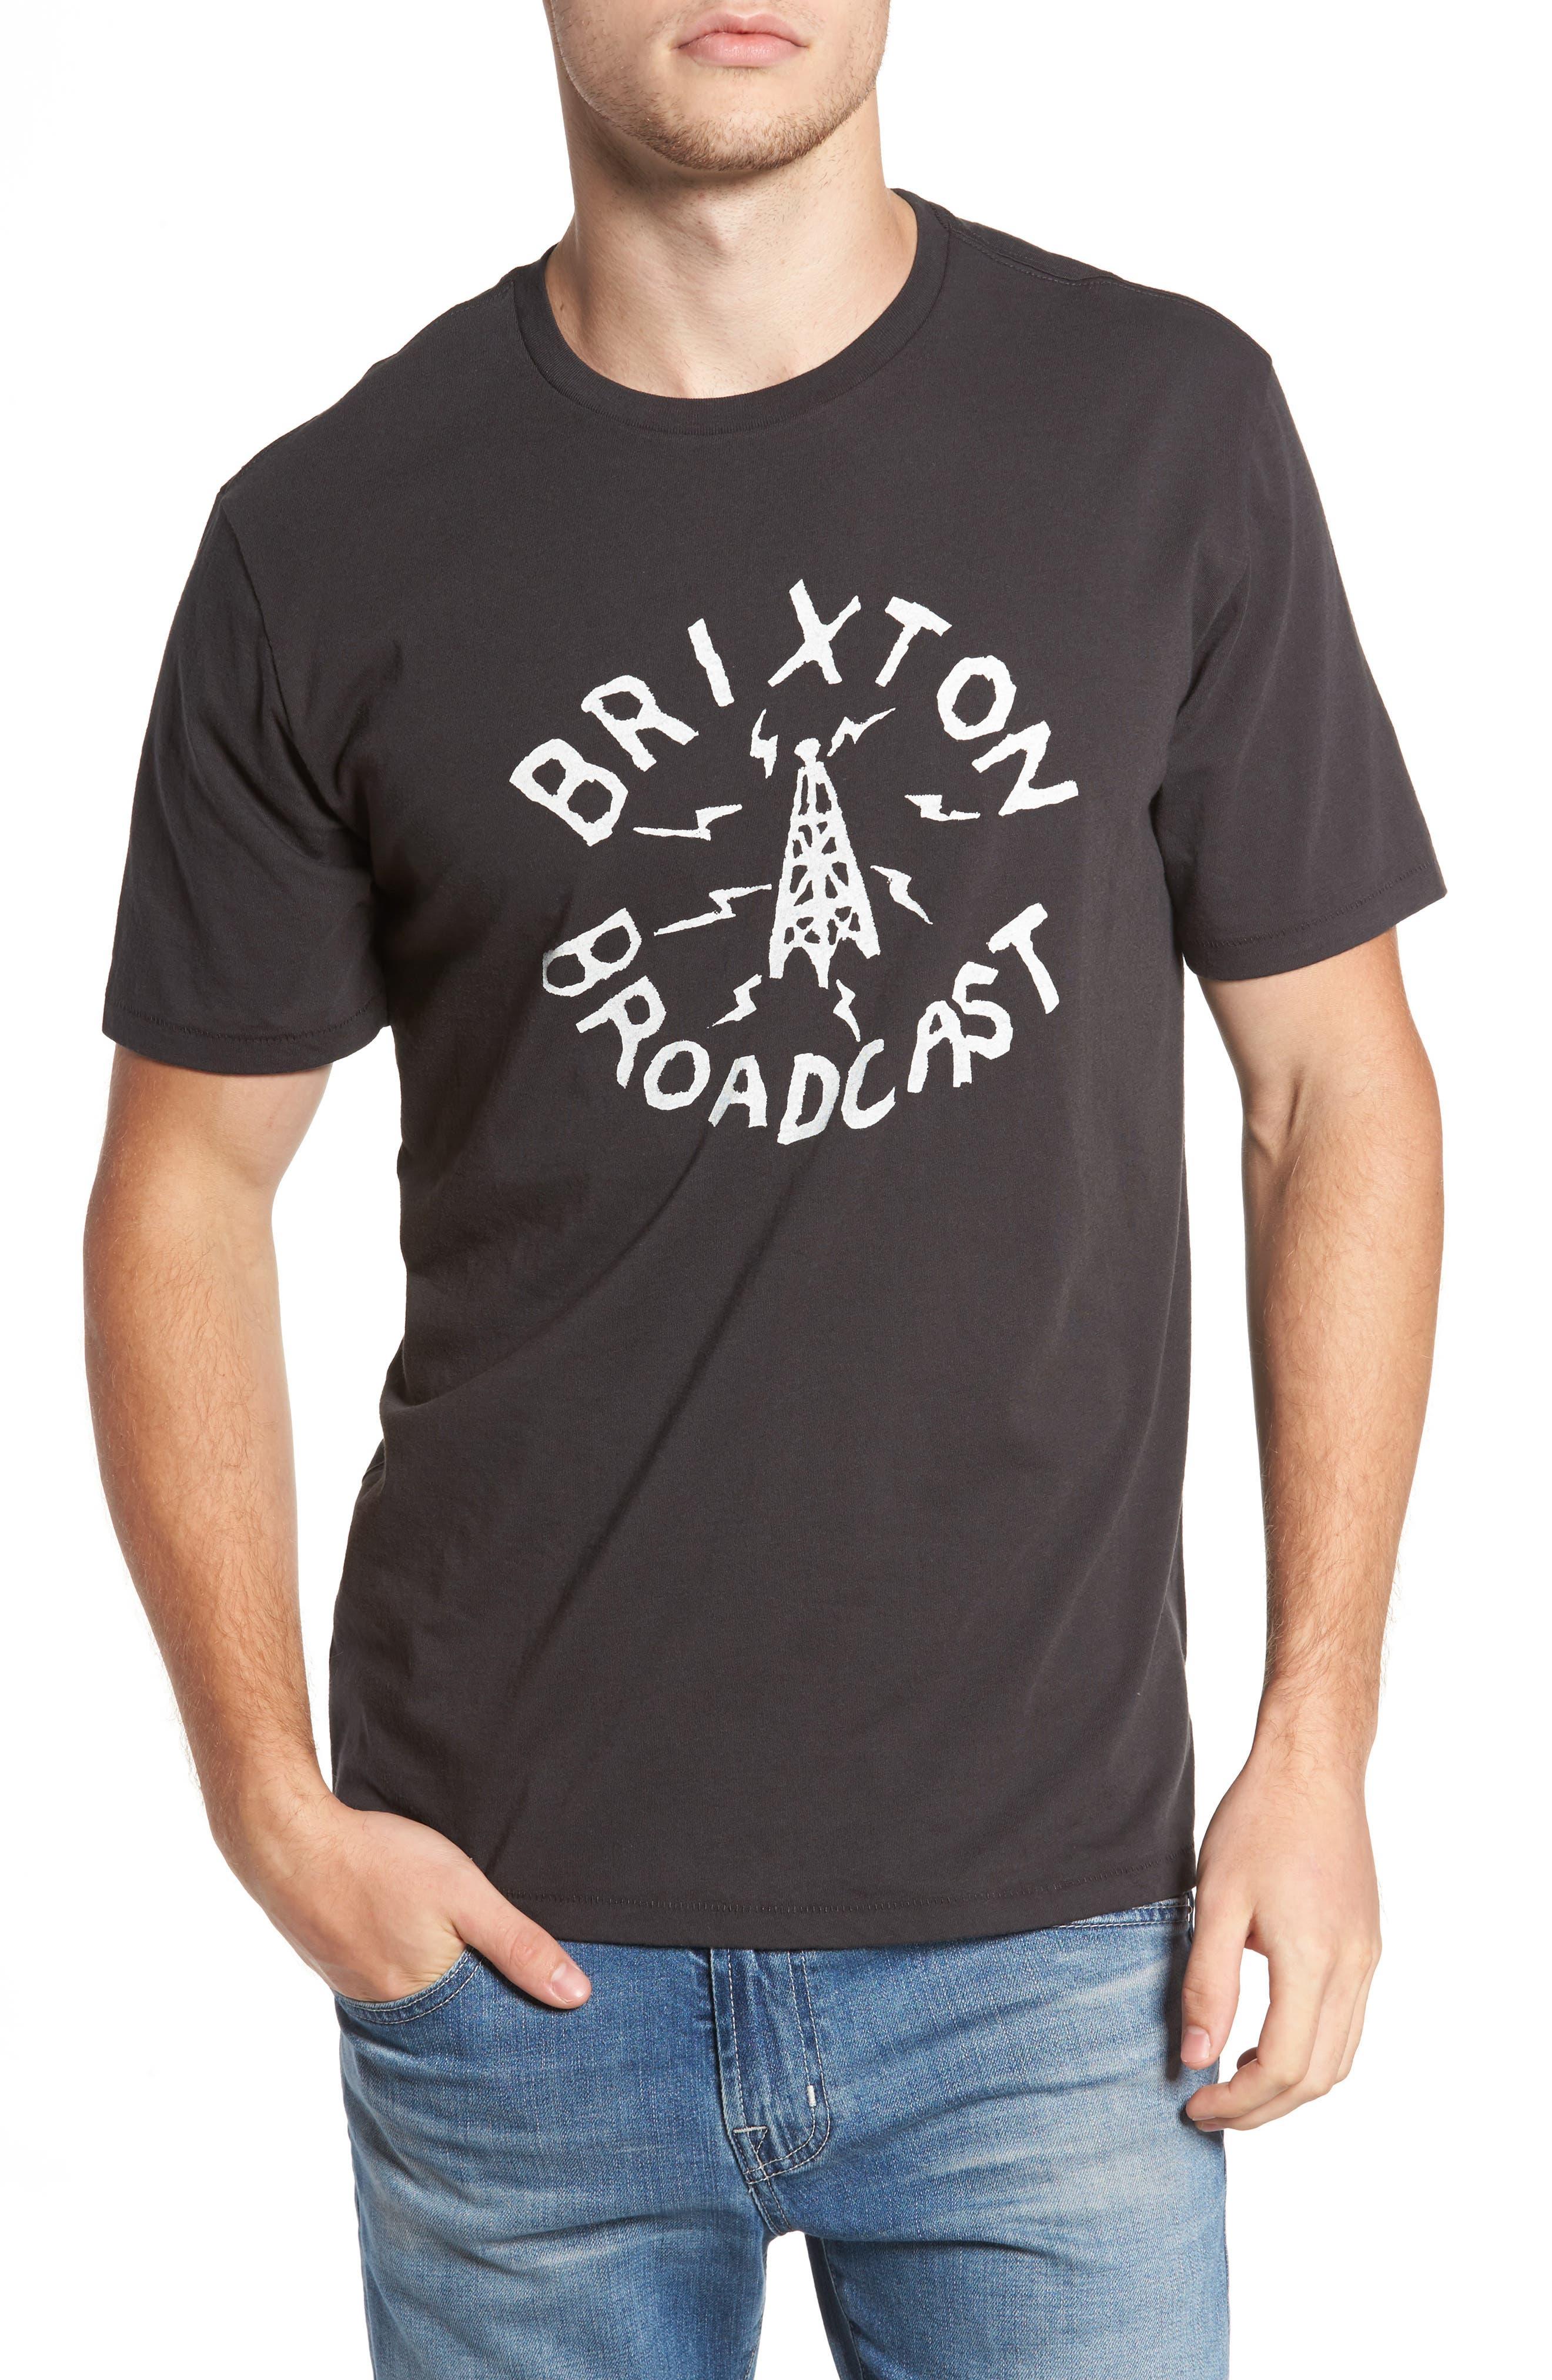 Broadcast T-Shirt,                             Main thumbnail 1, color,                             005